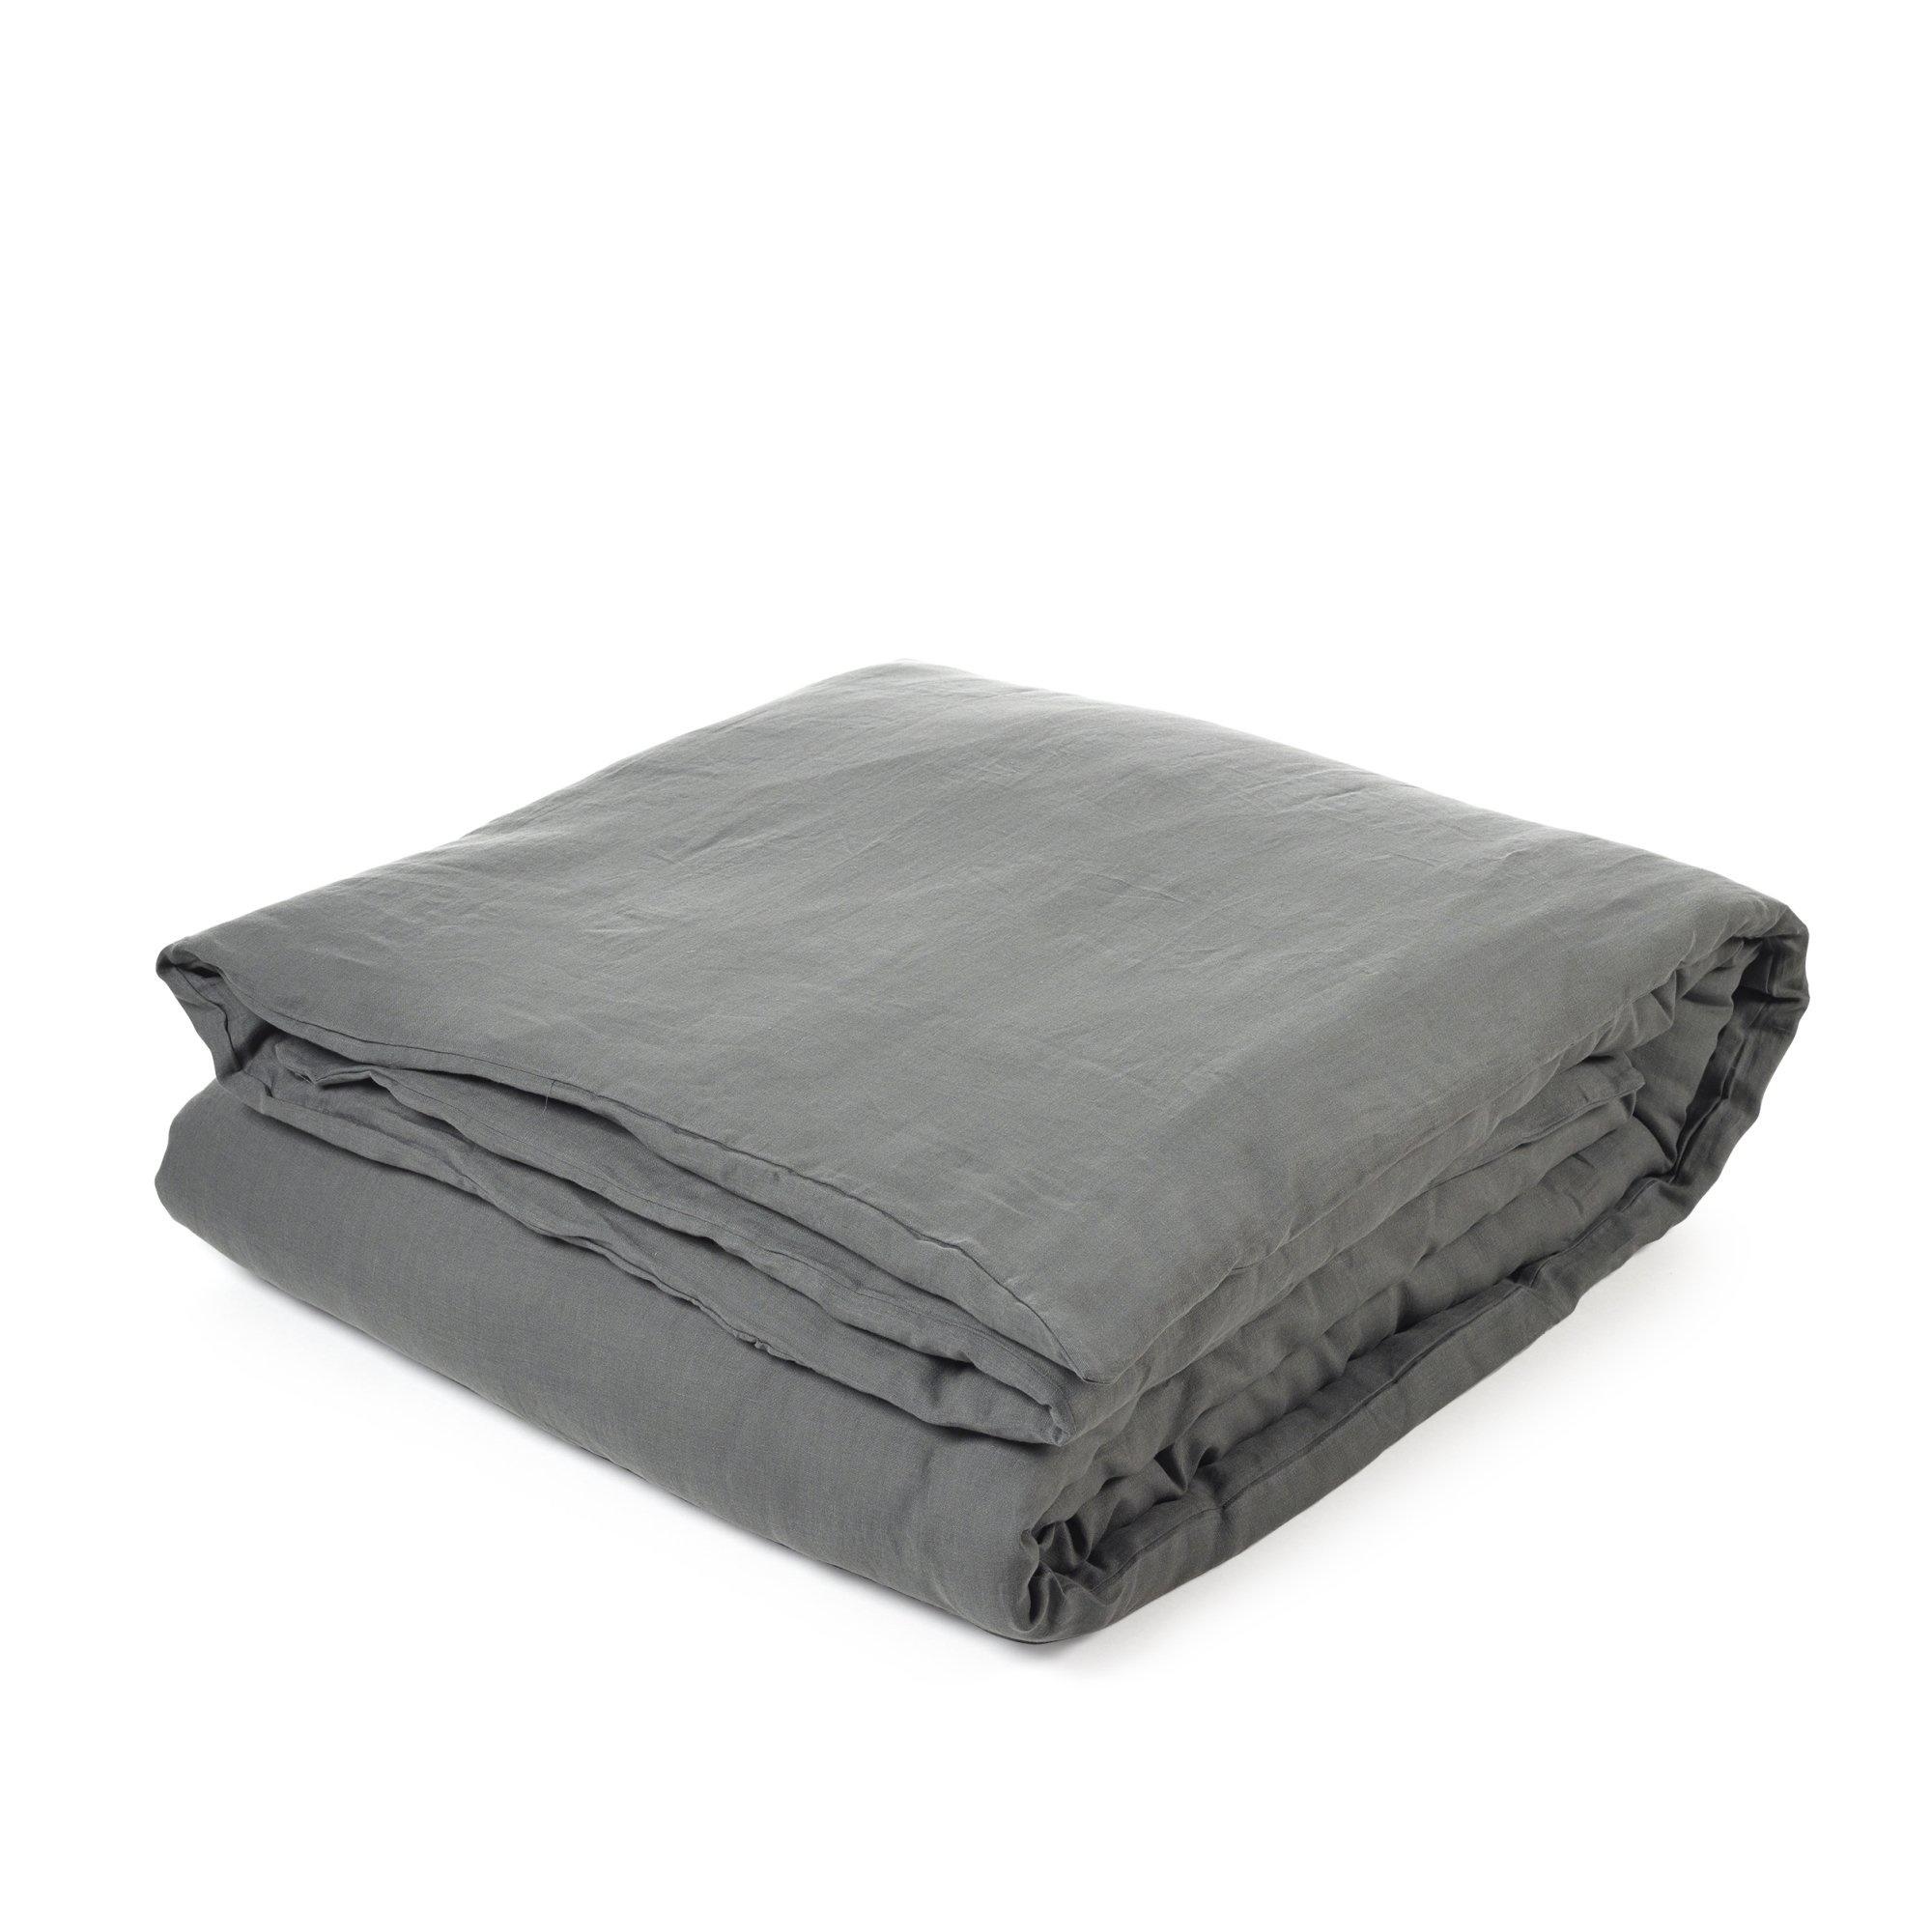 Duvet Cover - Santiago  - Dk Grey -  + Fitted Sheet - King-1